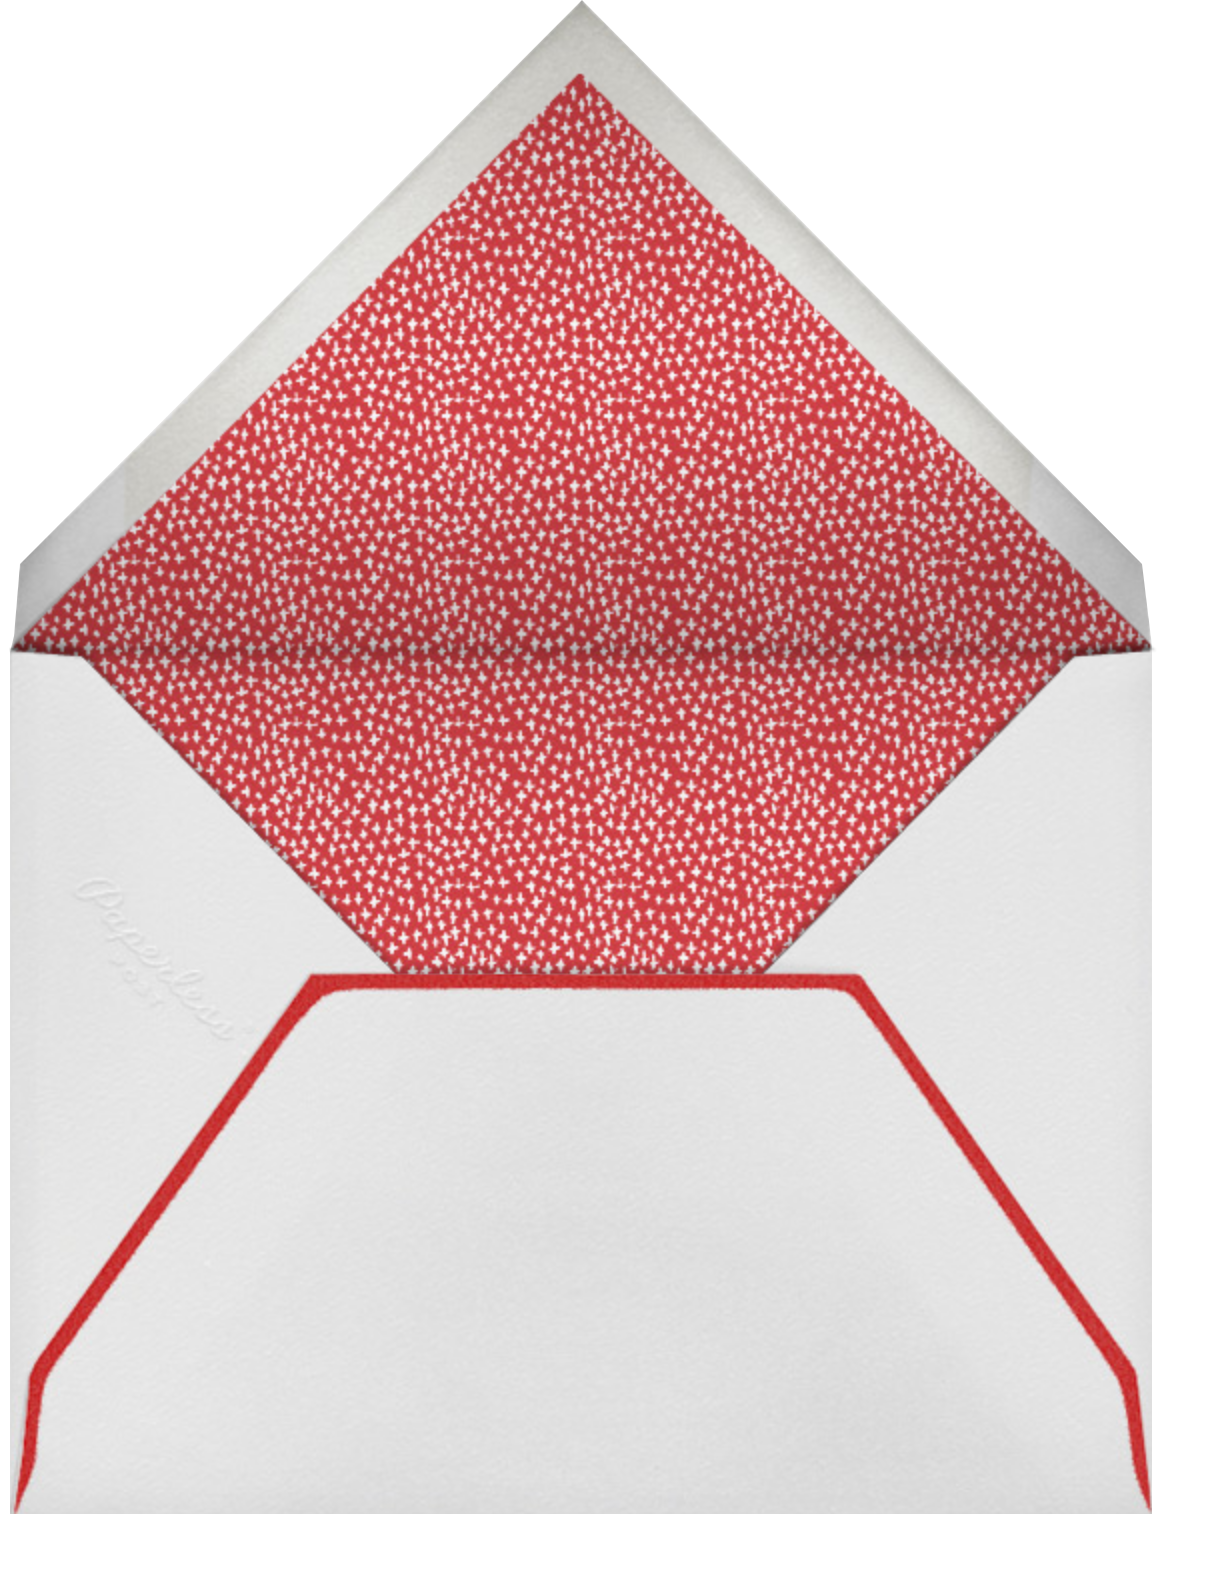 Worldly Birthday - Deep - Mr. Boddington's Studio - Envelope